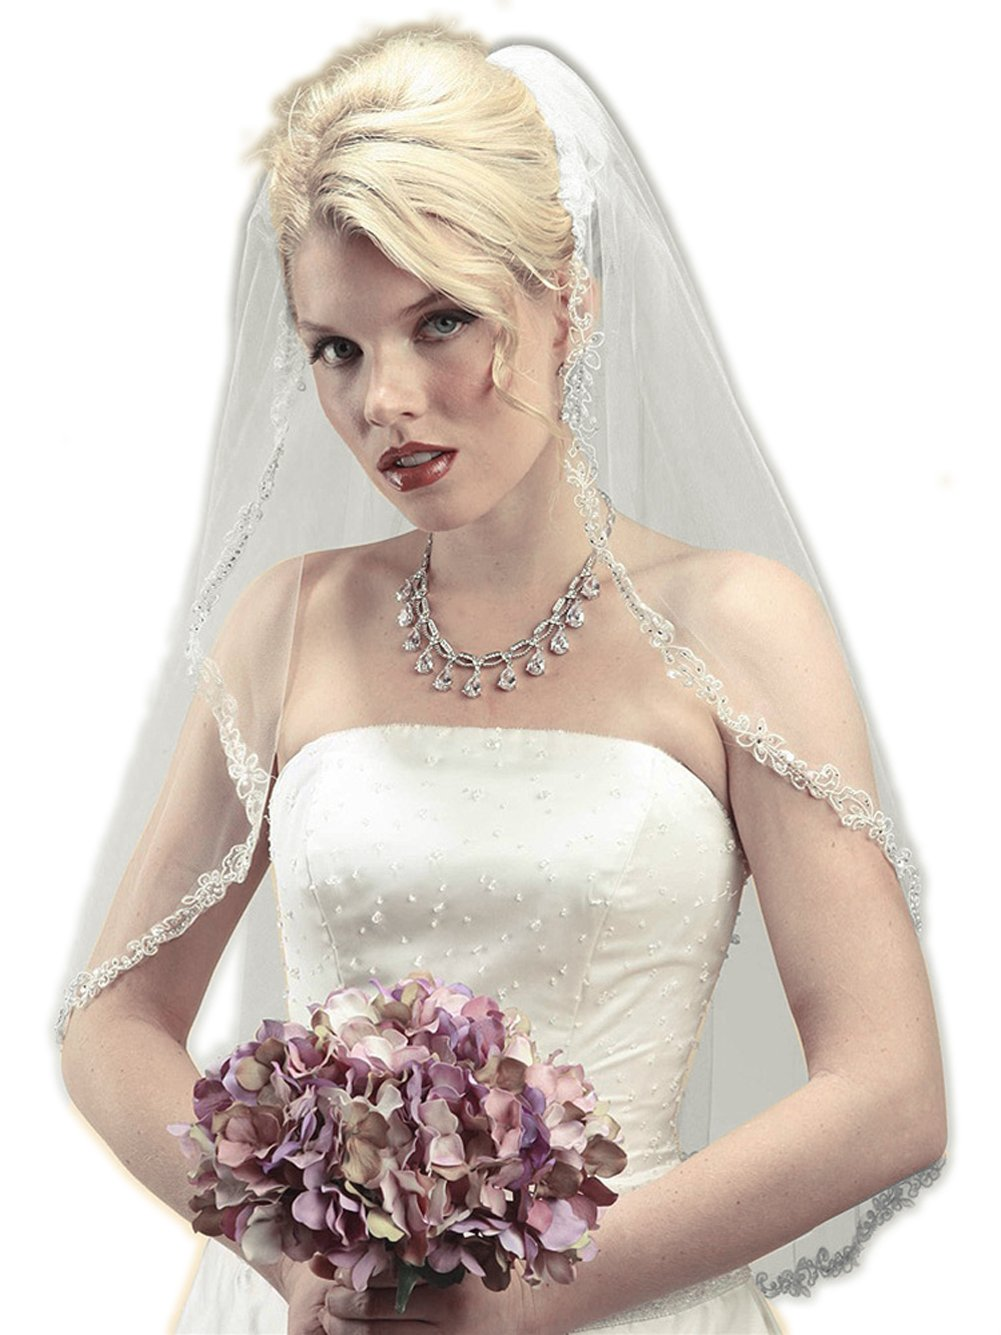 Mariell Women's Rhinestone Edge Mantilla Wedding Veil with Floral Applique - Ivory